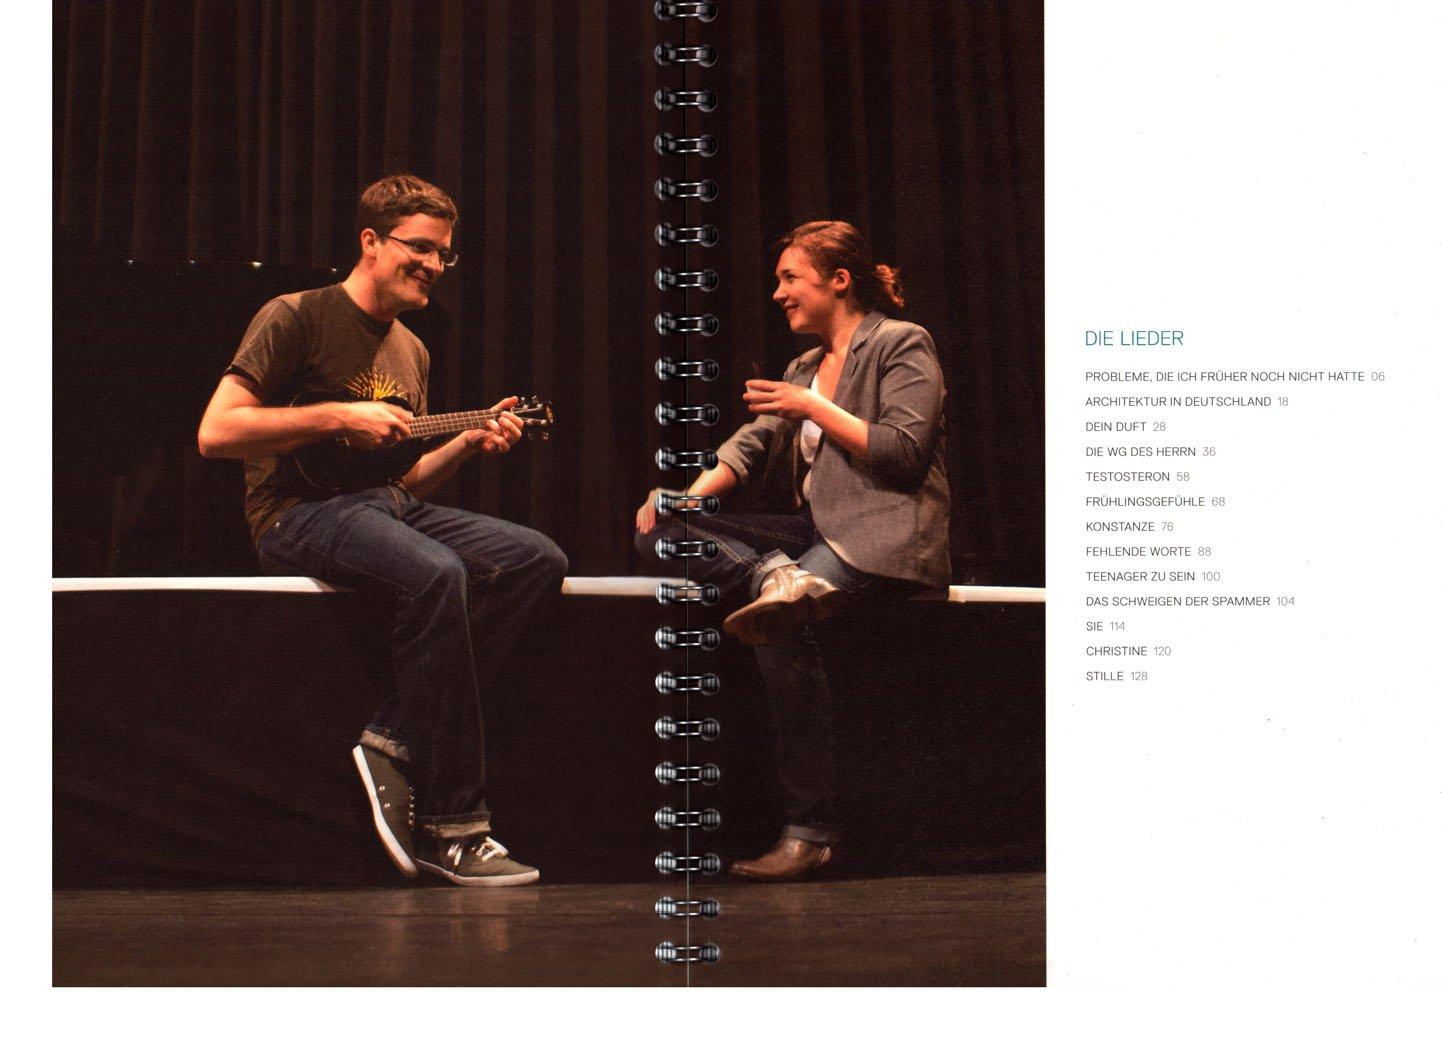 Bodo wartke Piano delikte - Ordenador libro a Bodo wartkes viertem Música Kabarett de programa Piano delikte para Canta, jugar, Bailar o tambor - con ...